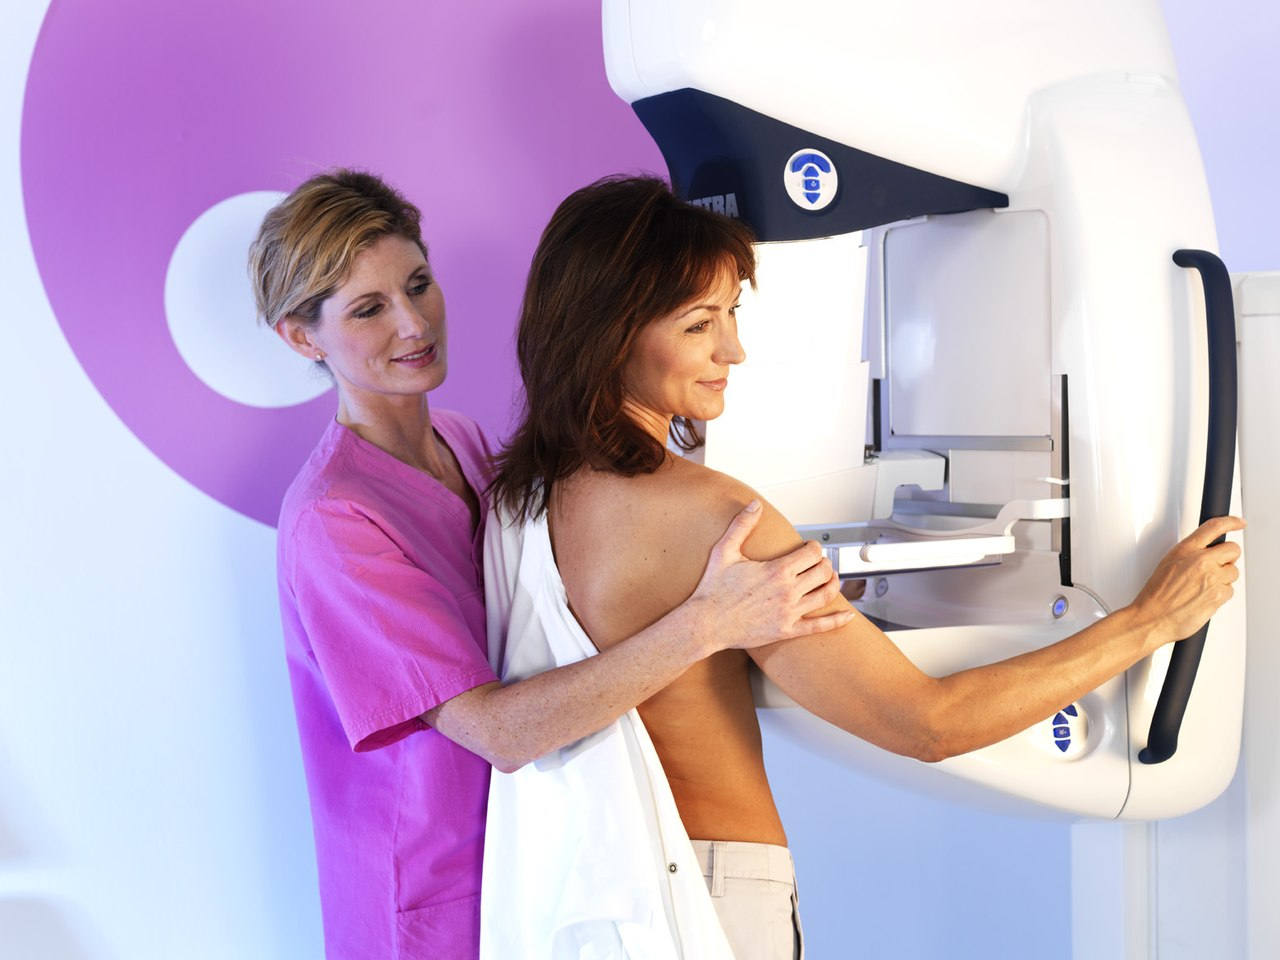 Статистика заболеваний раком молочной железы